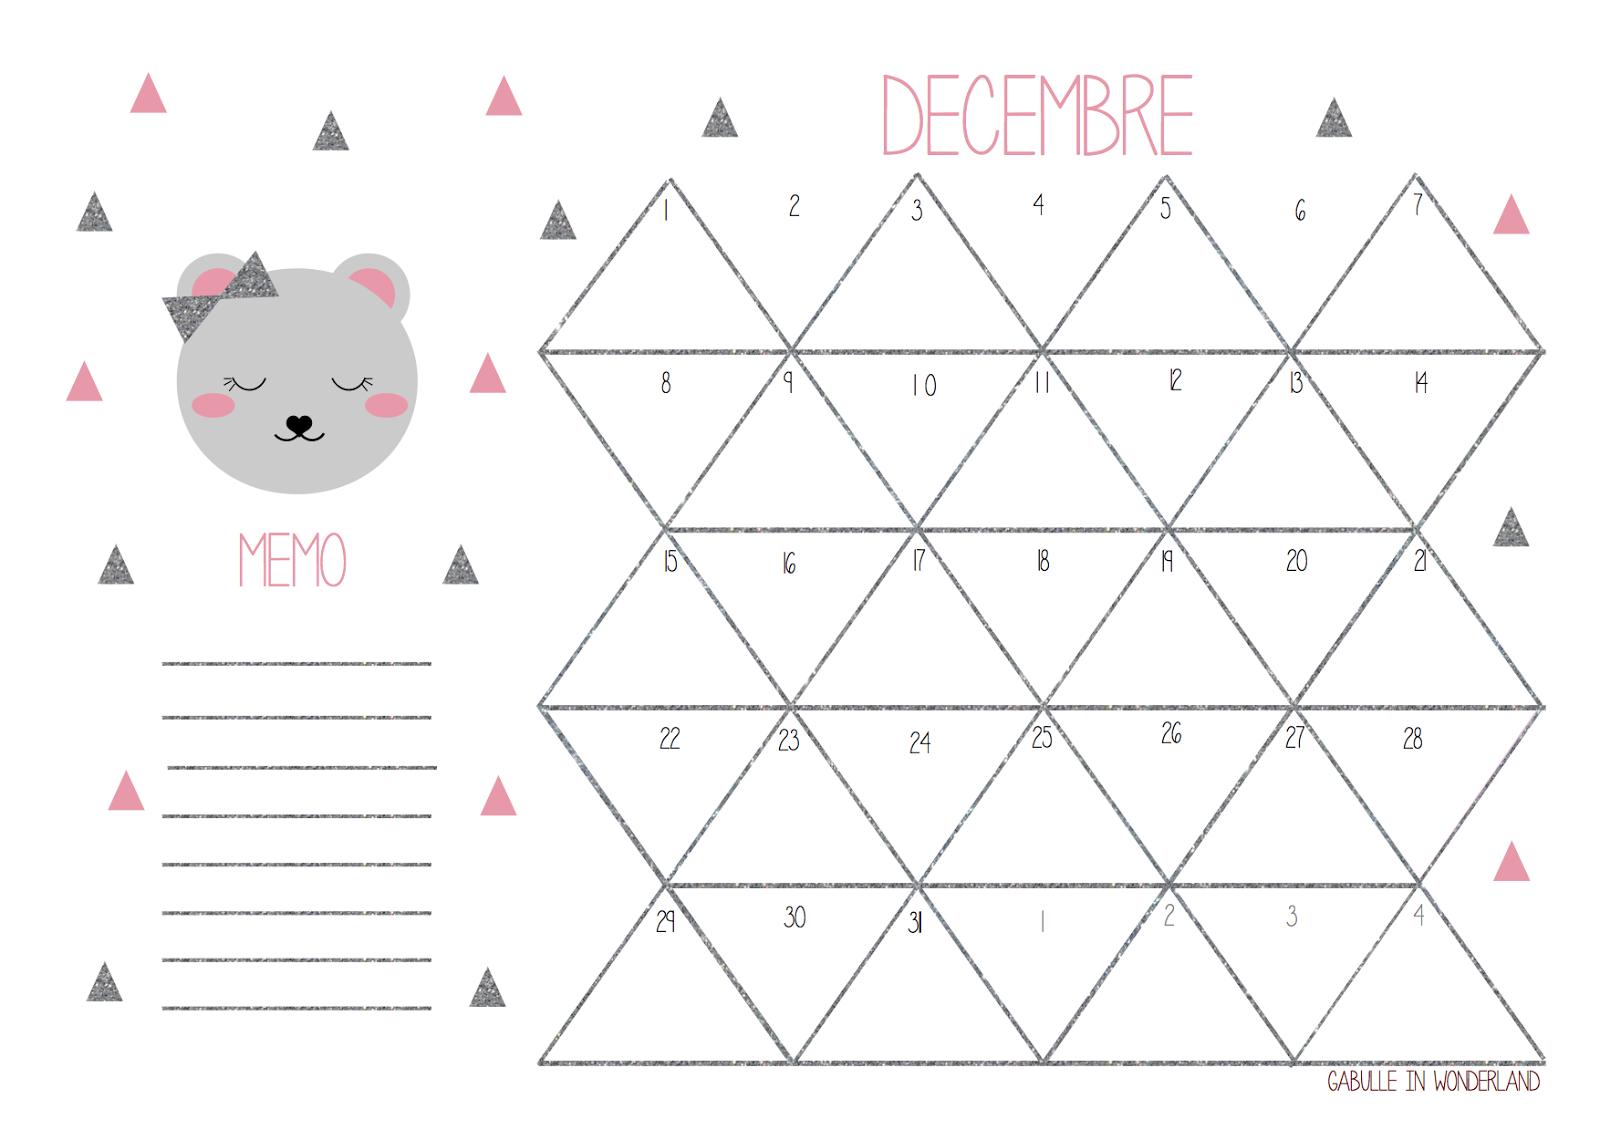 Gabulle in wonderland calendrier de d cembre imprimer for Calendrier jardin juin 2015